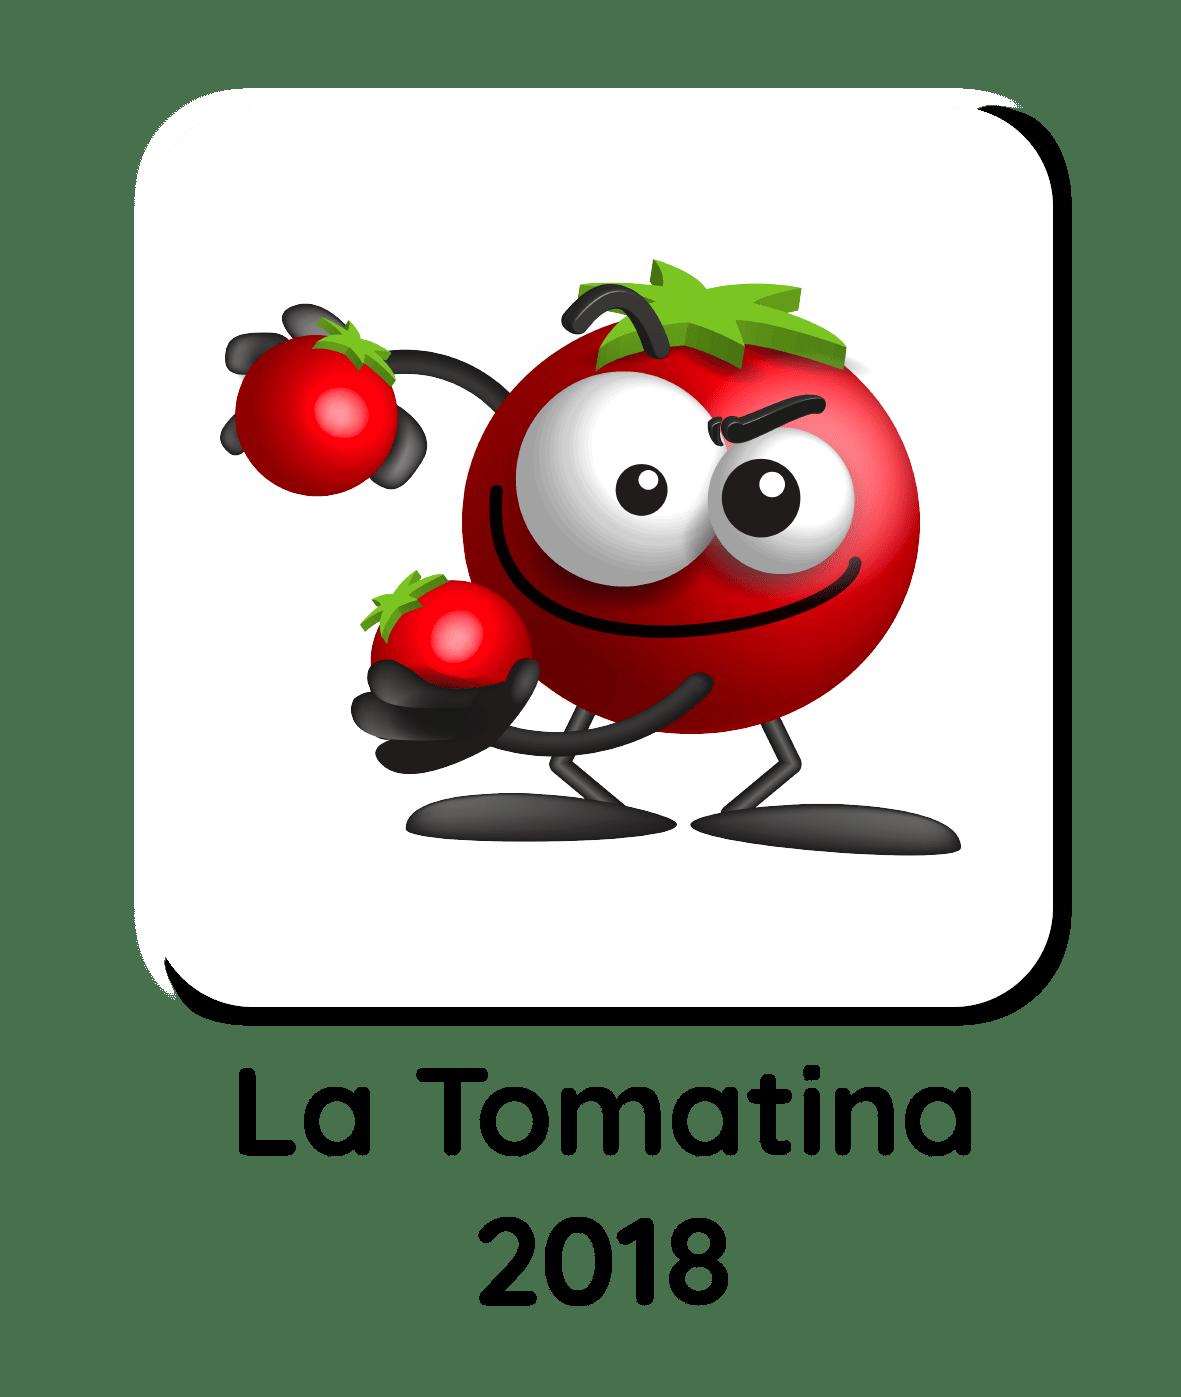 La-Tomatina-2018